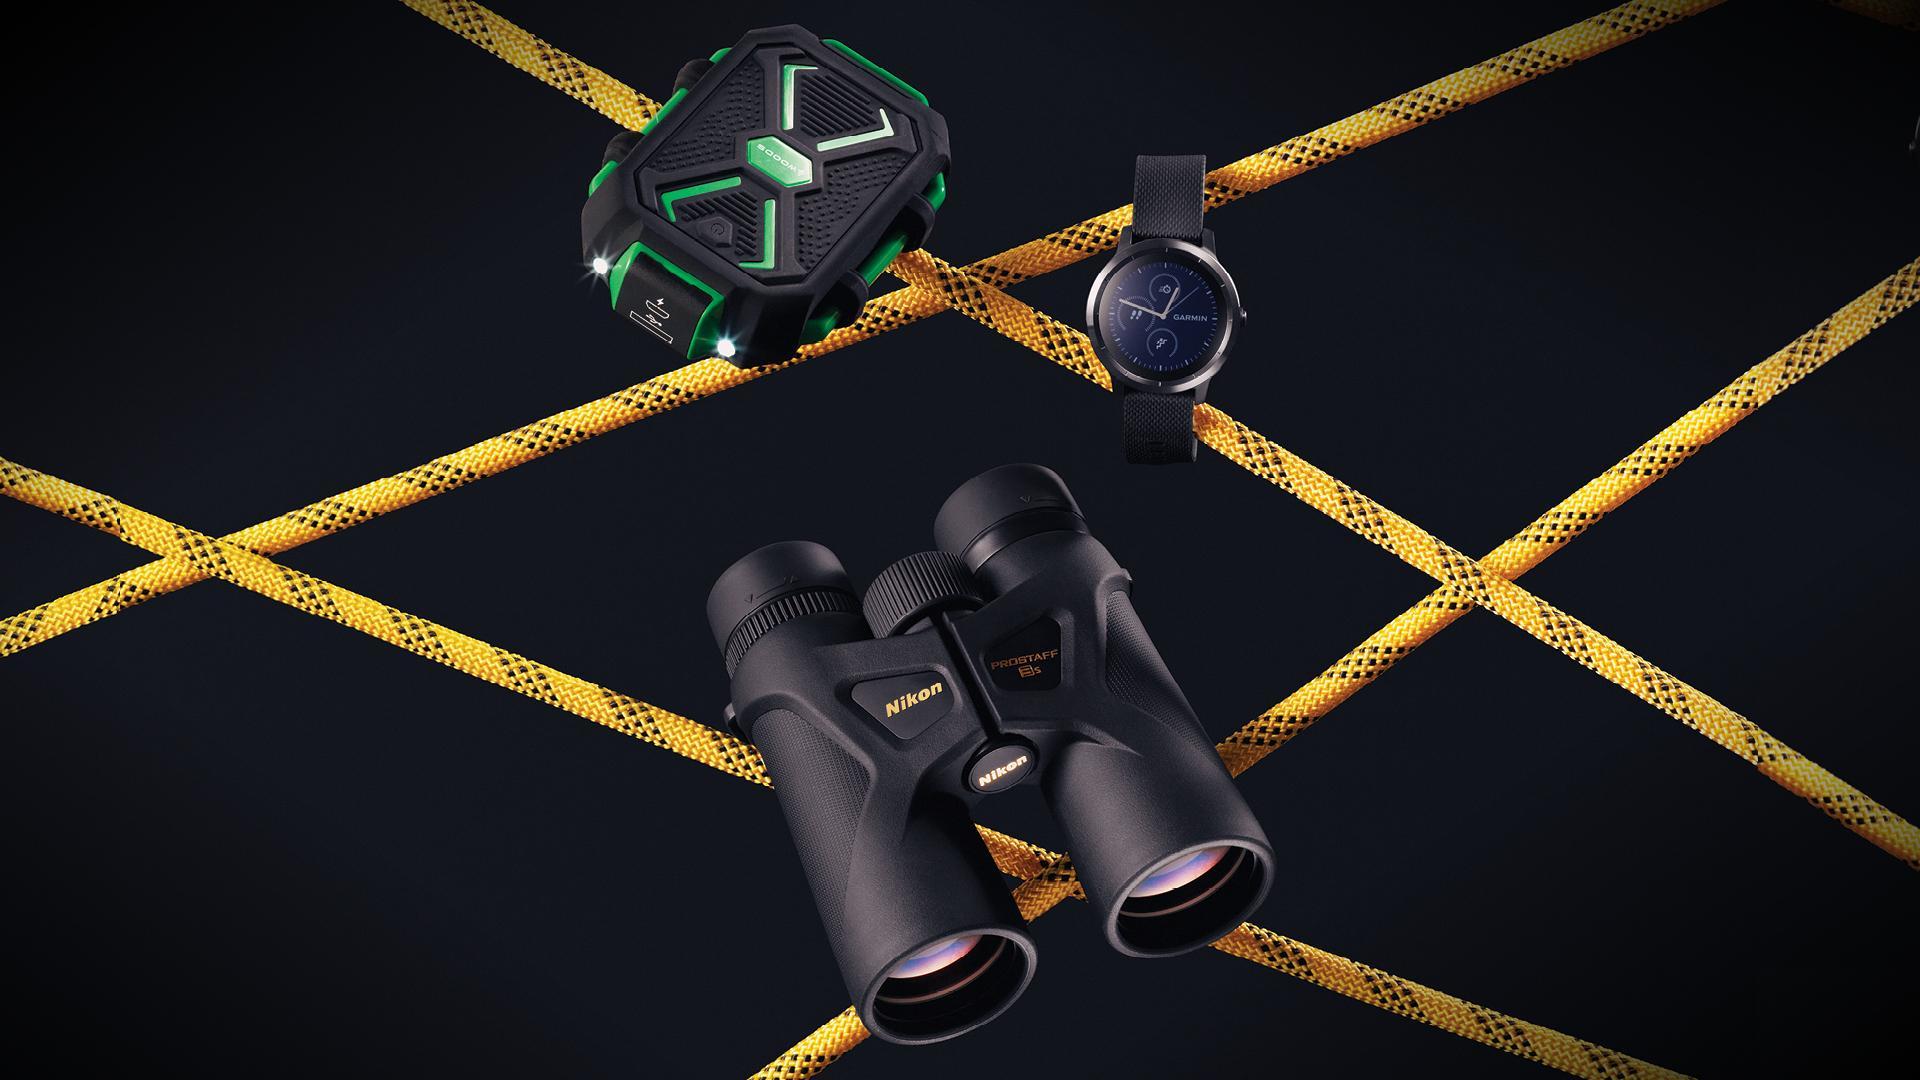 hiking essentials fall 2020 | binoculars, power pack, Garmin smartwatch